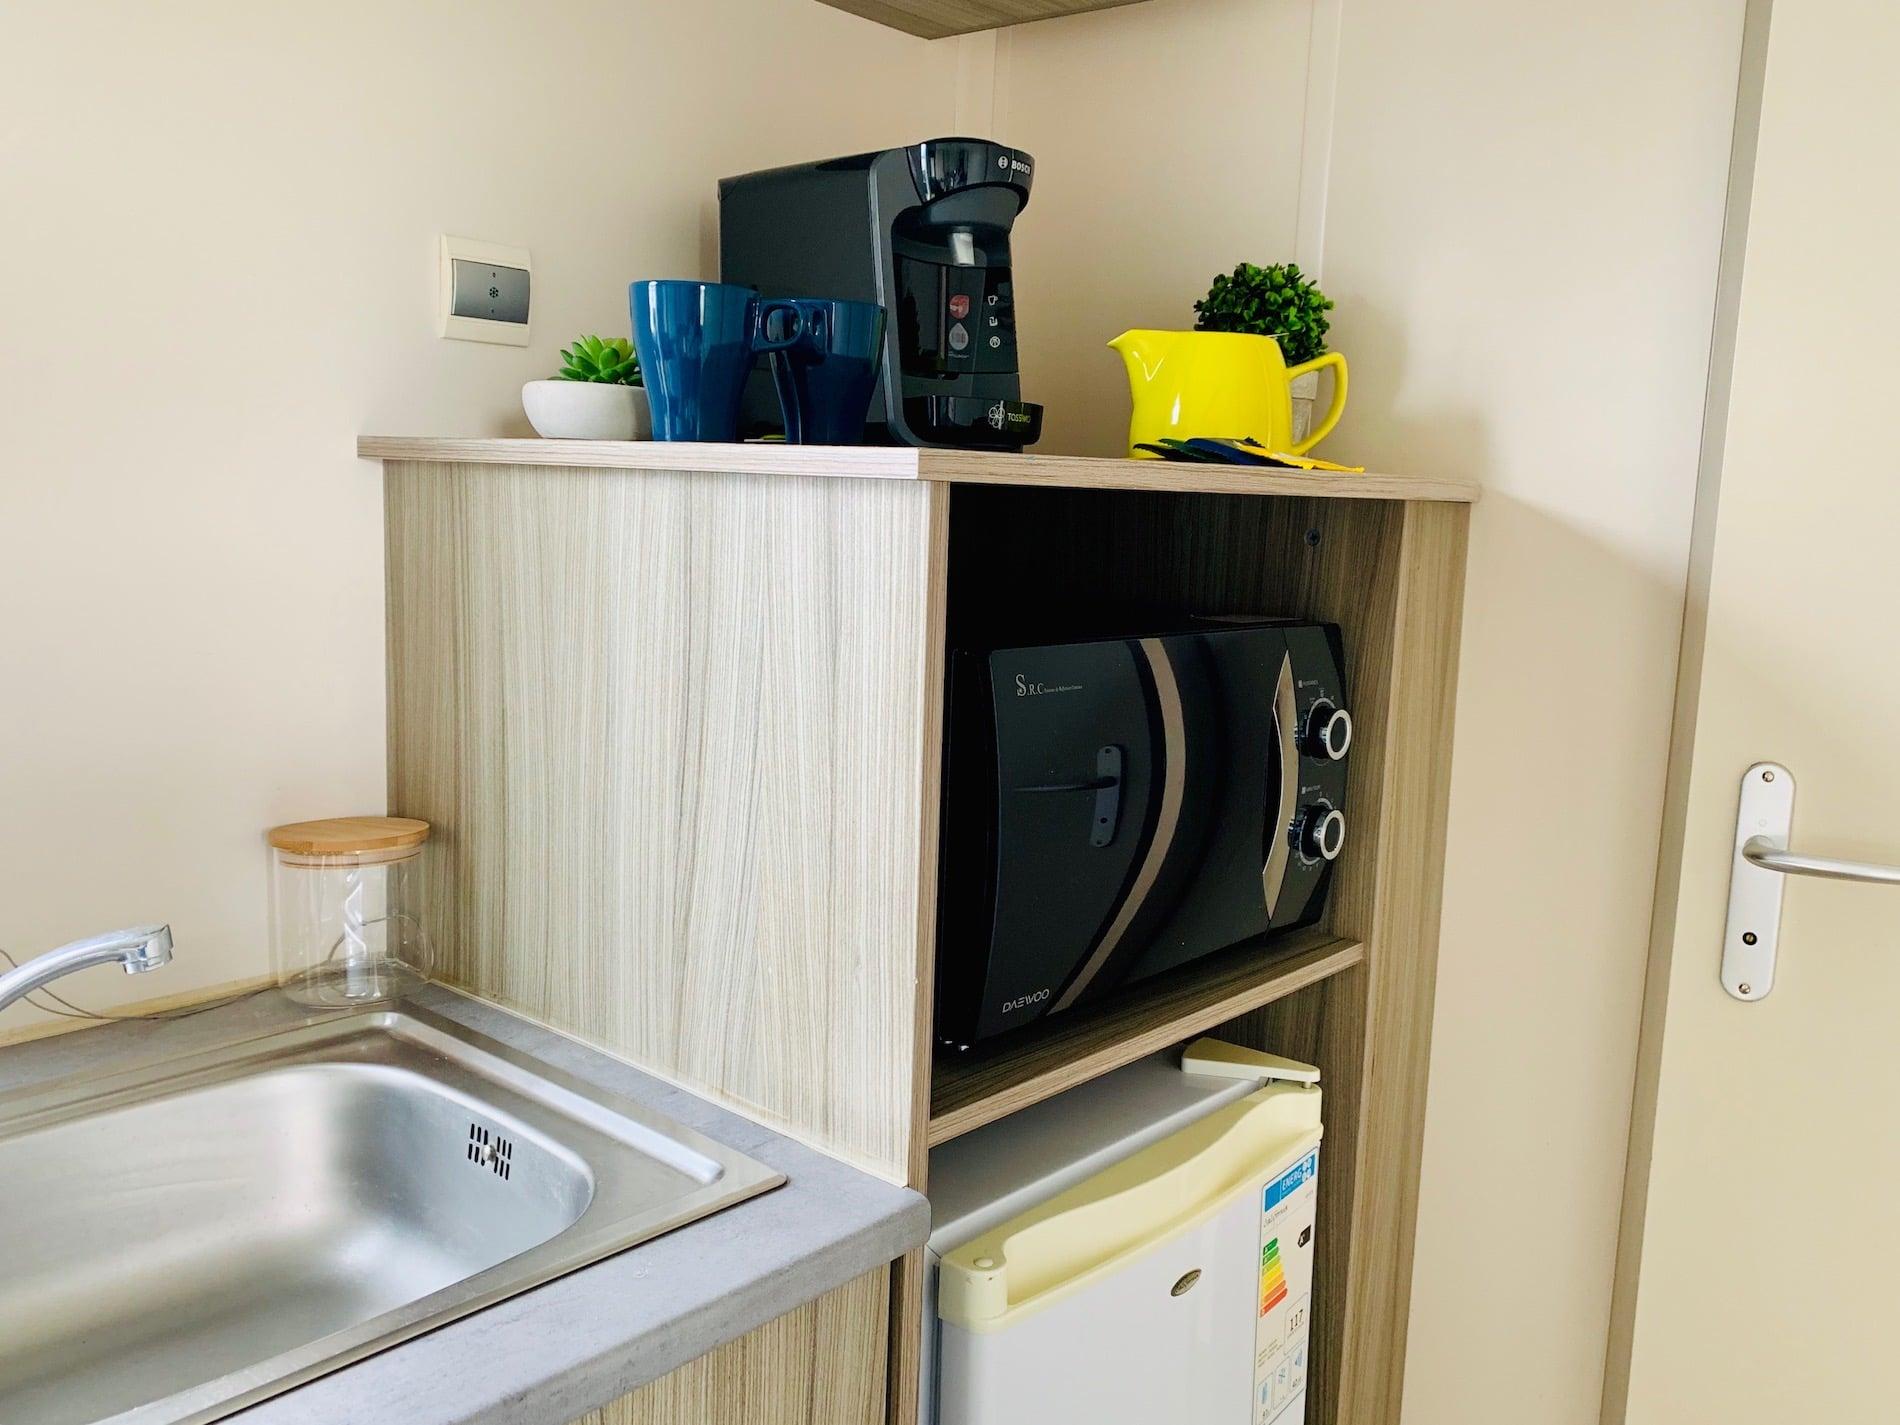 MOBIL HOME CAMPING PORT BLANC DINARD EQUIPEMENTS FRIGO MICRO ONDES